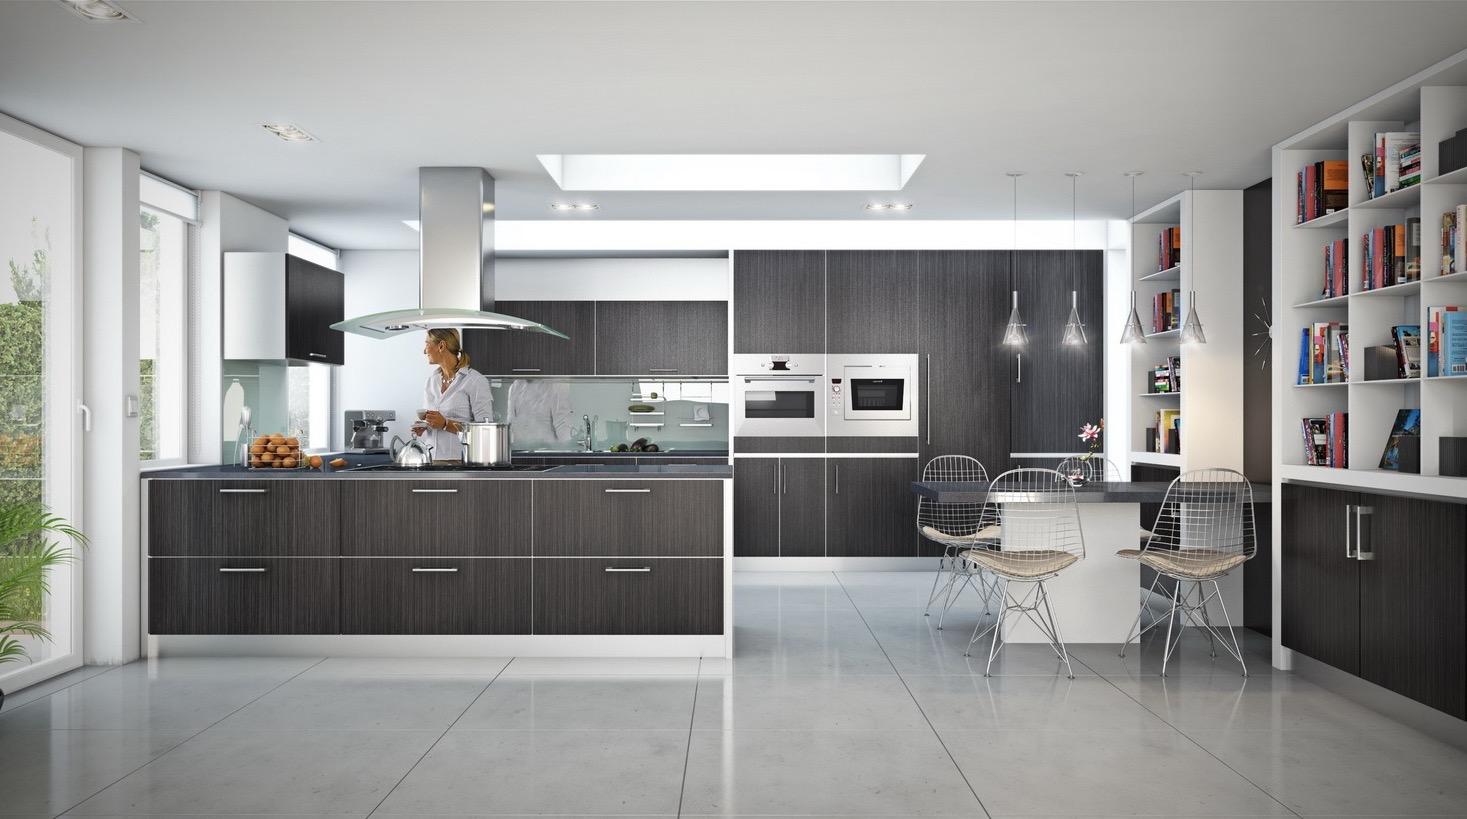 Open Kitchen Design Effective Concept (View 11 of 23)